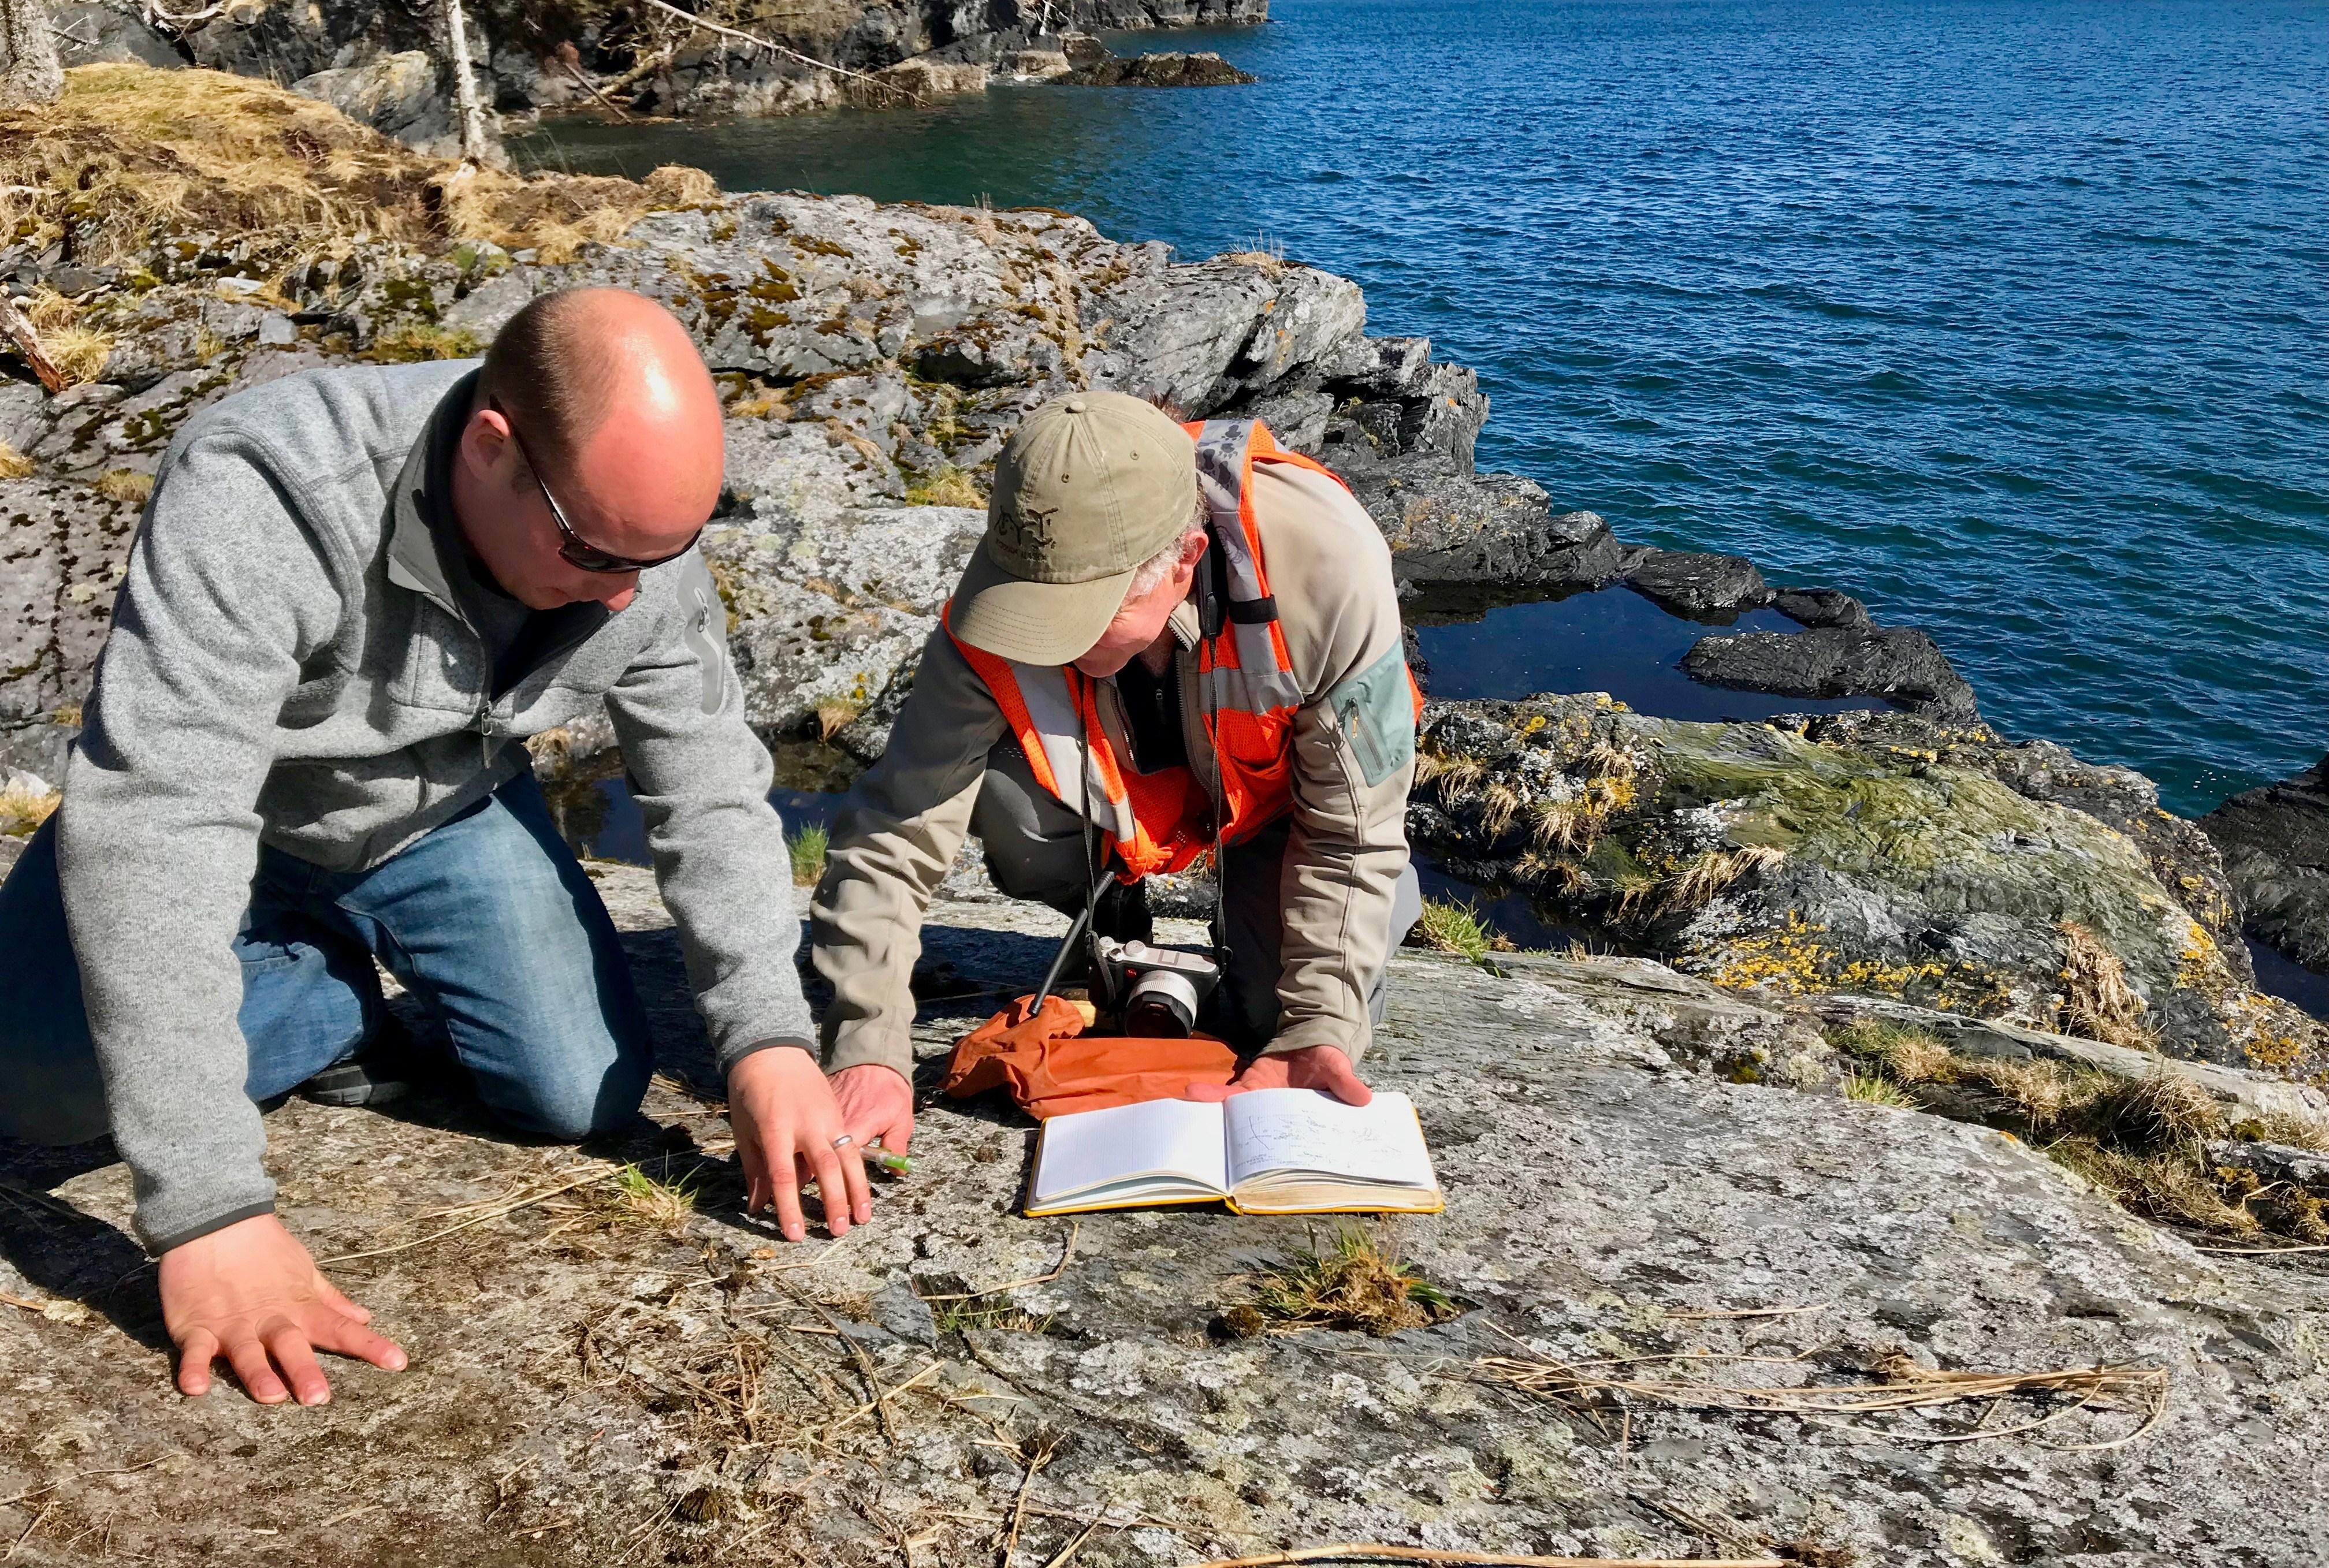 Museum archaeologist Patrick Saltonstall and helicopter pilot Keller Wattum document a petroglyph site on Afognak. (Photo courtesy Patrick Saltonstall)